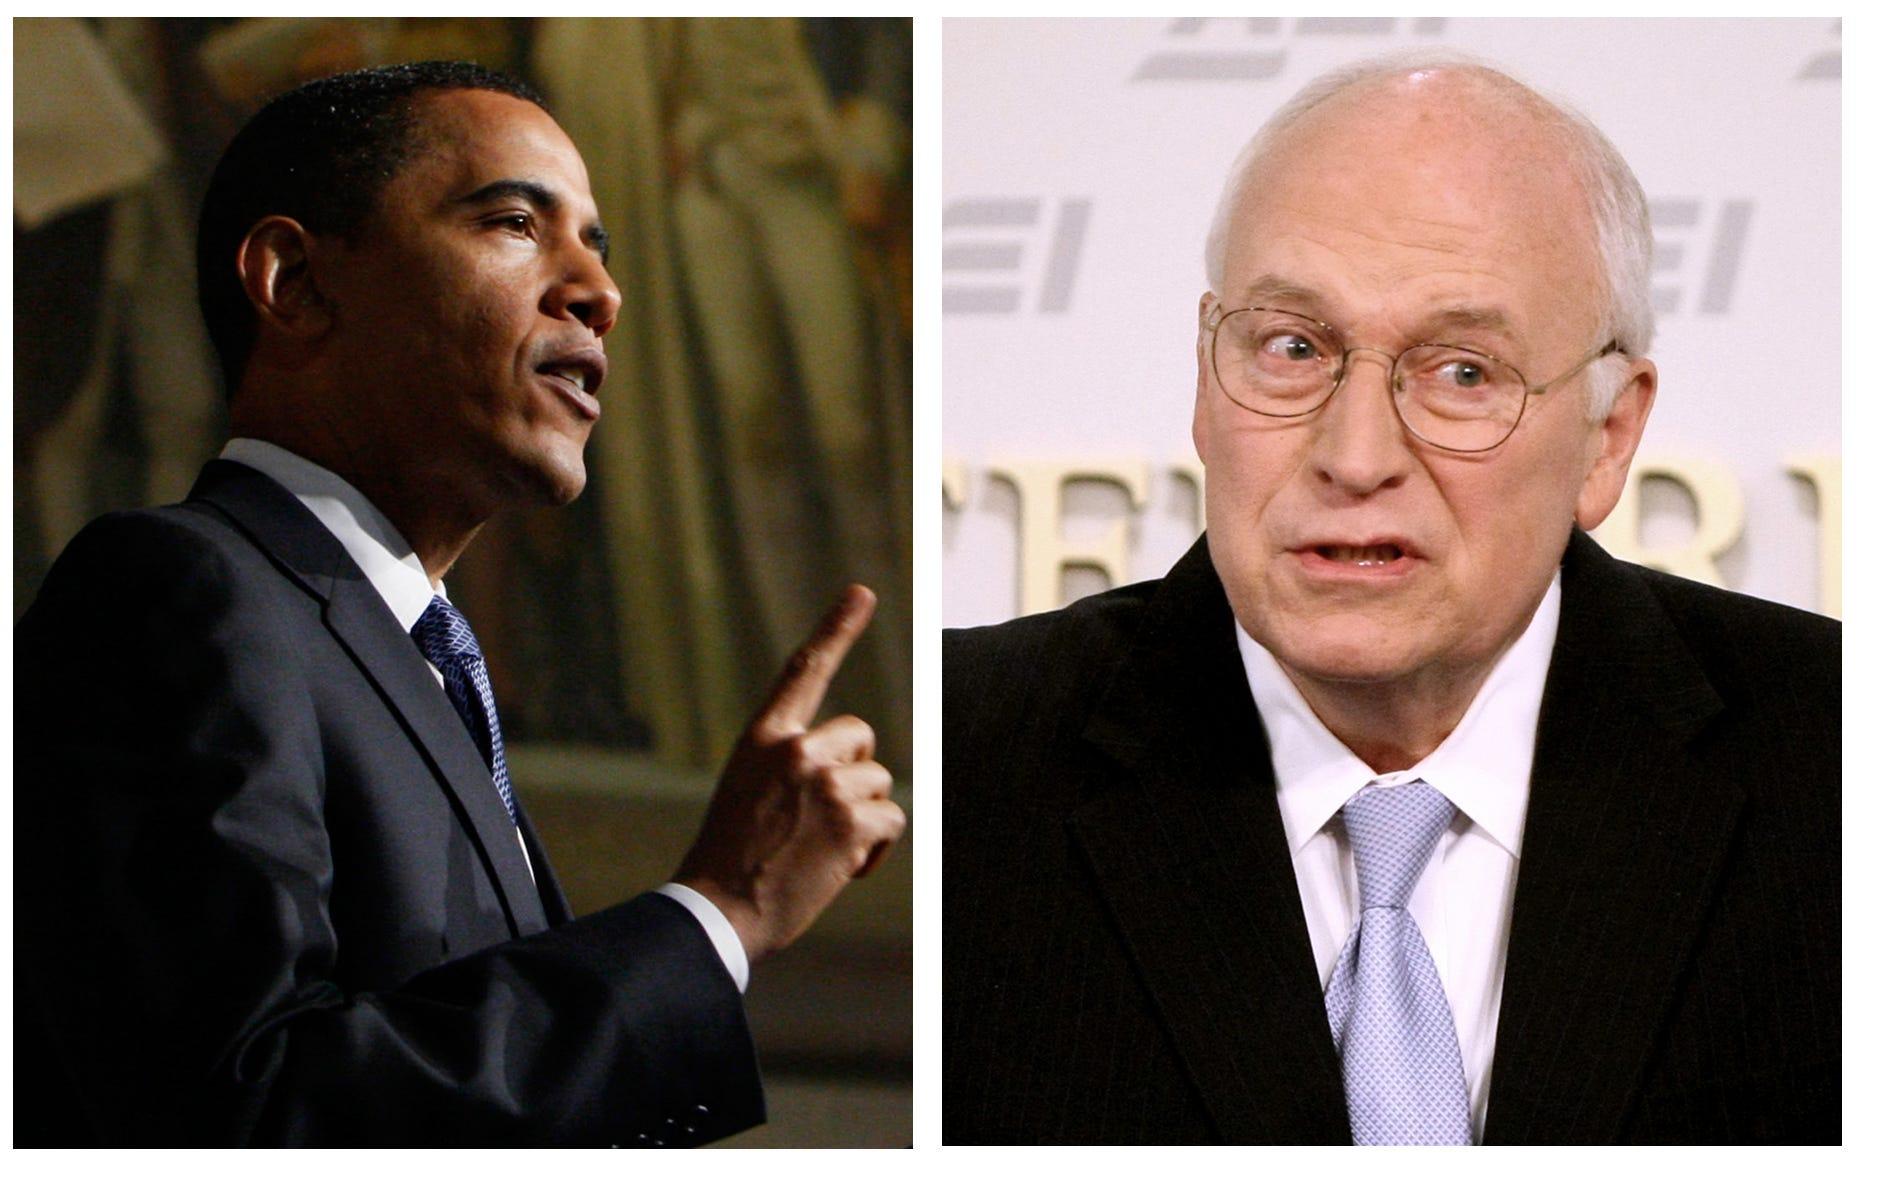 Dick cheyney and barak obama